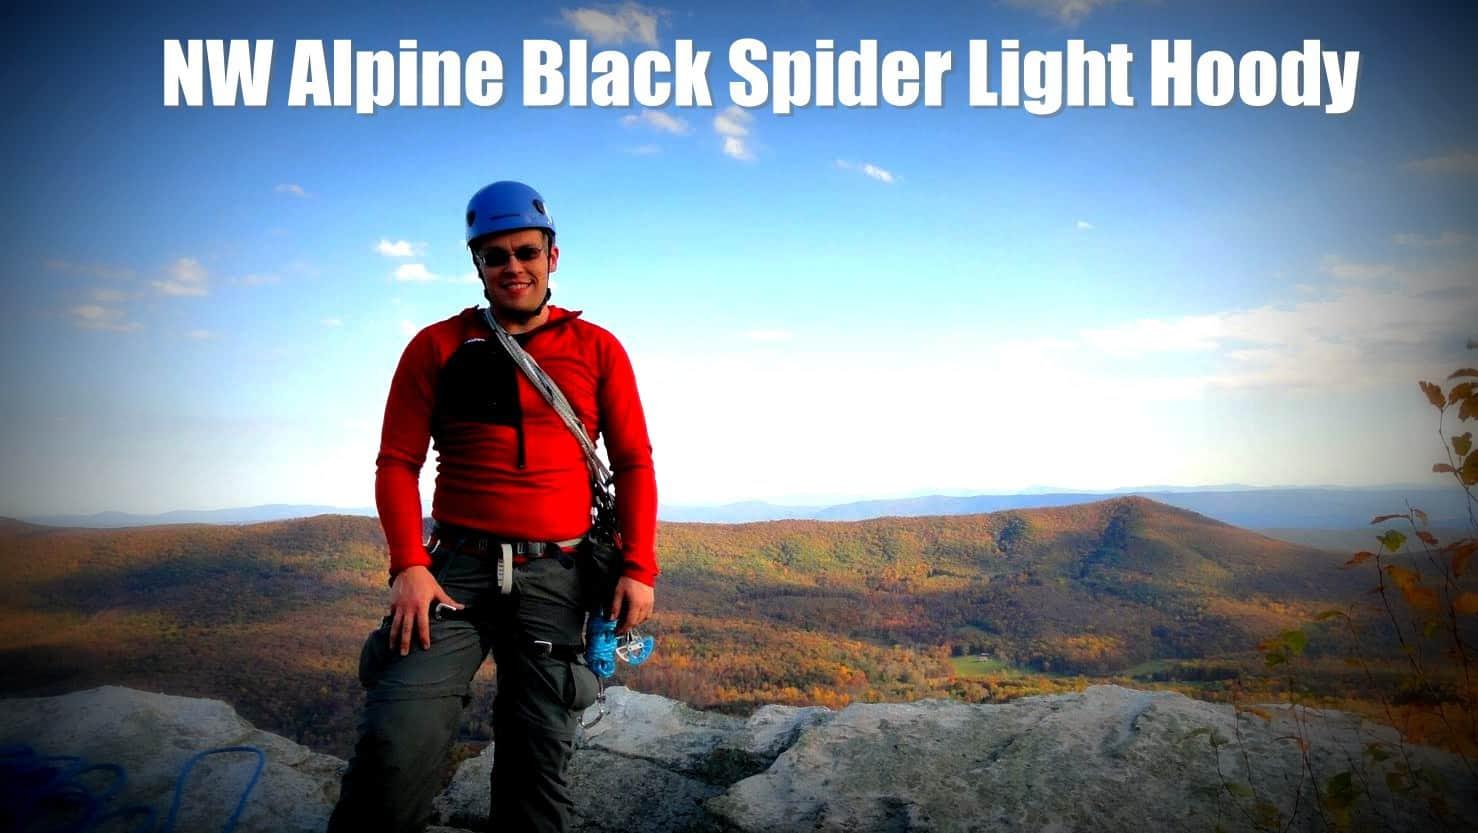 NW Alpine Black Spider Light Hoody